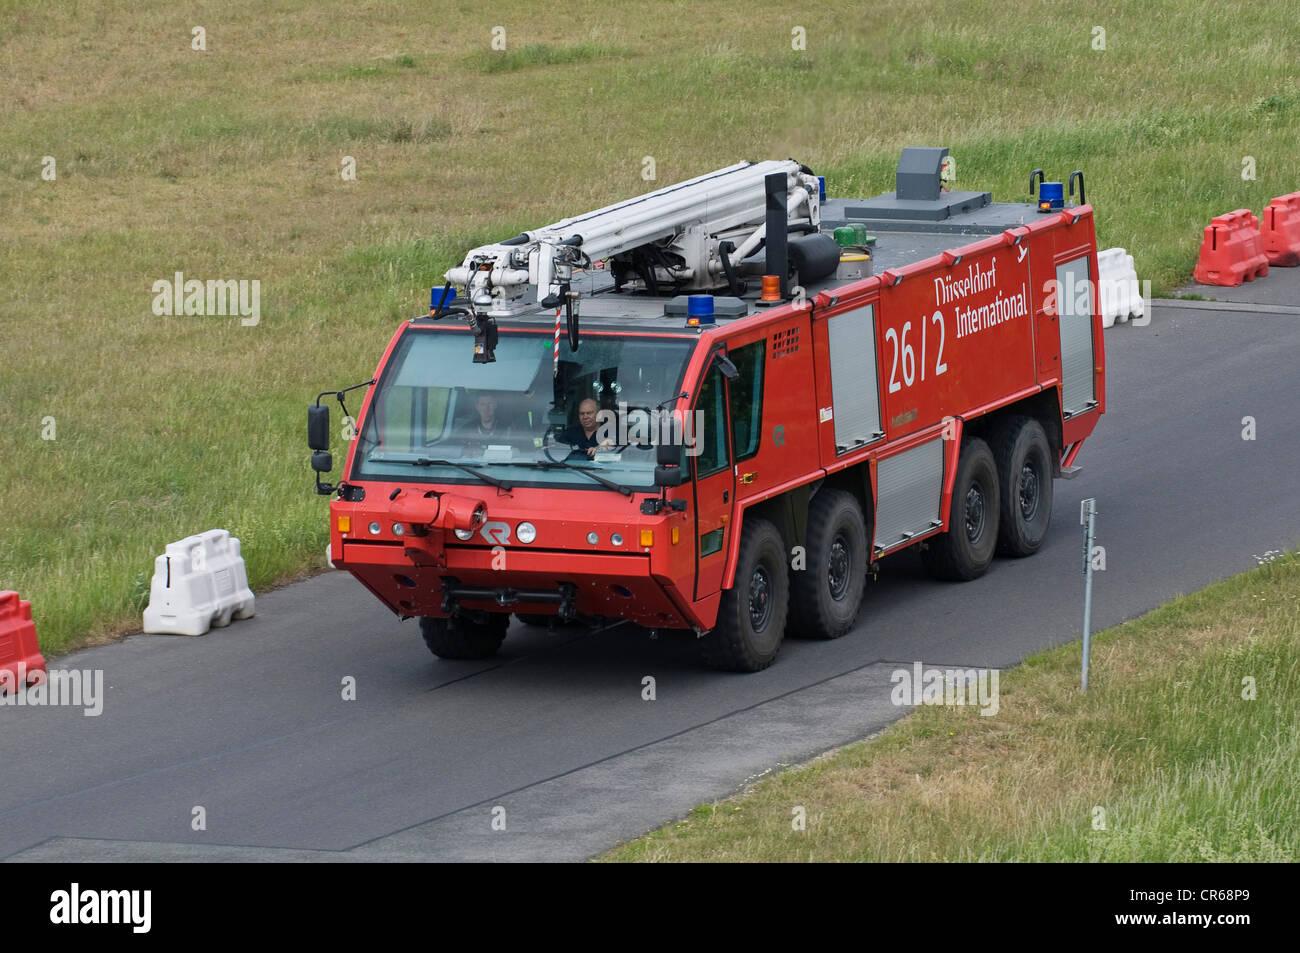 Emergency vehicle of the fire brigade, Duesseldorf International Airport, Duesseldorf, North Rhine-Westphalia, Germany, - Stock Image